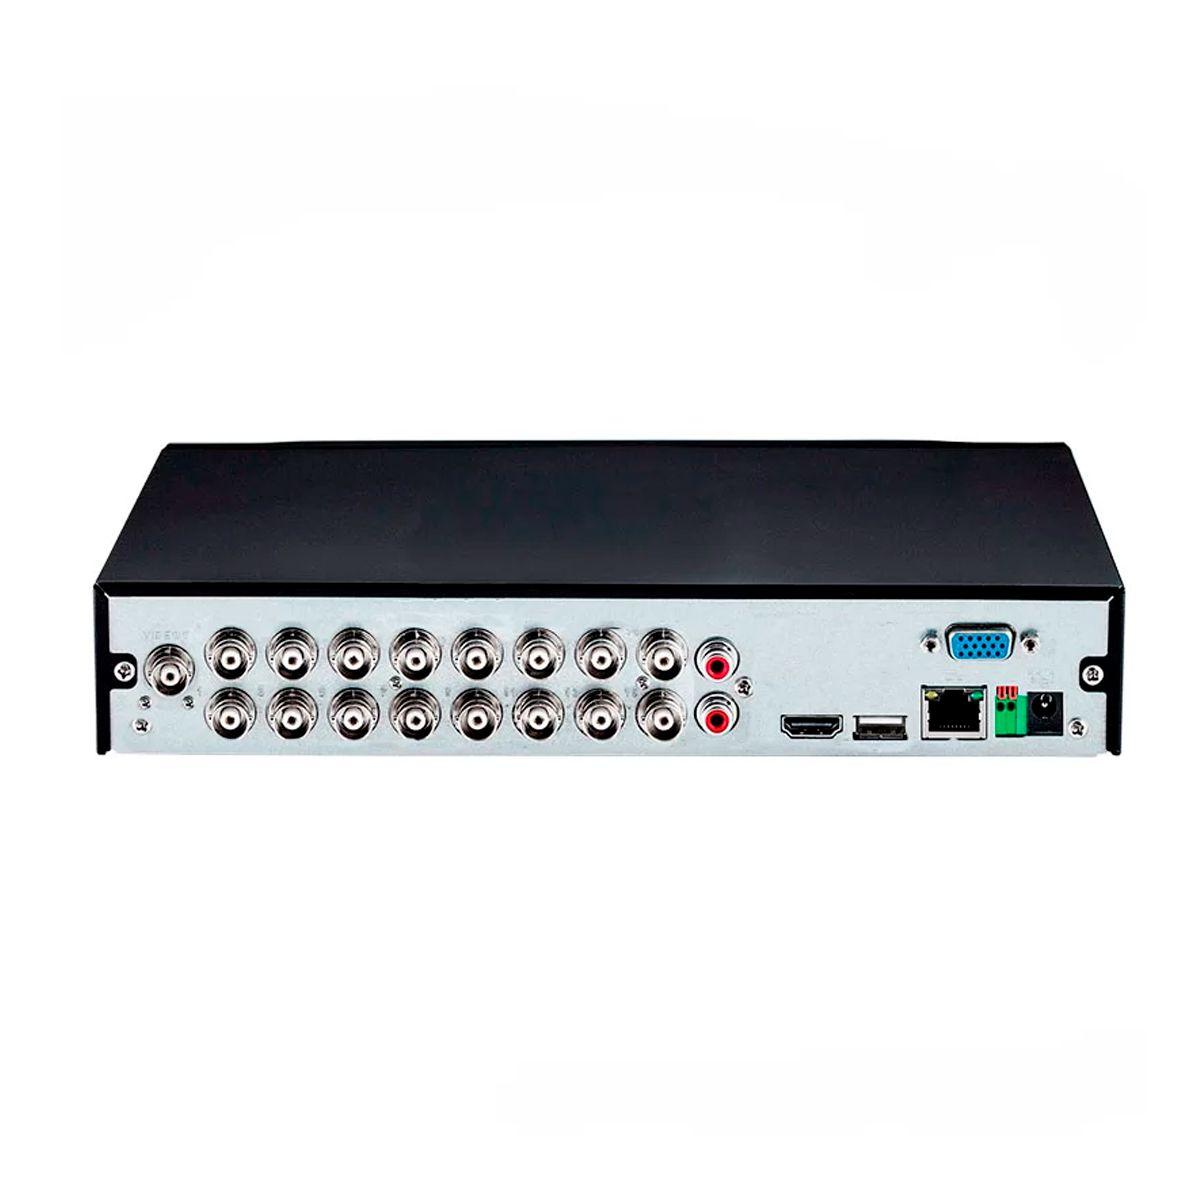 Kit 12 Câmeras VHD 1010 B G5  10m Infravermelho de Visão Noturna + DVR Intelbras + HD 1TB + Acessórios  - Tudo Forte